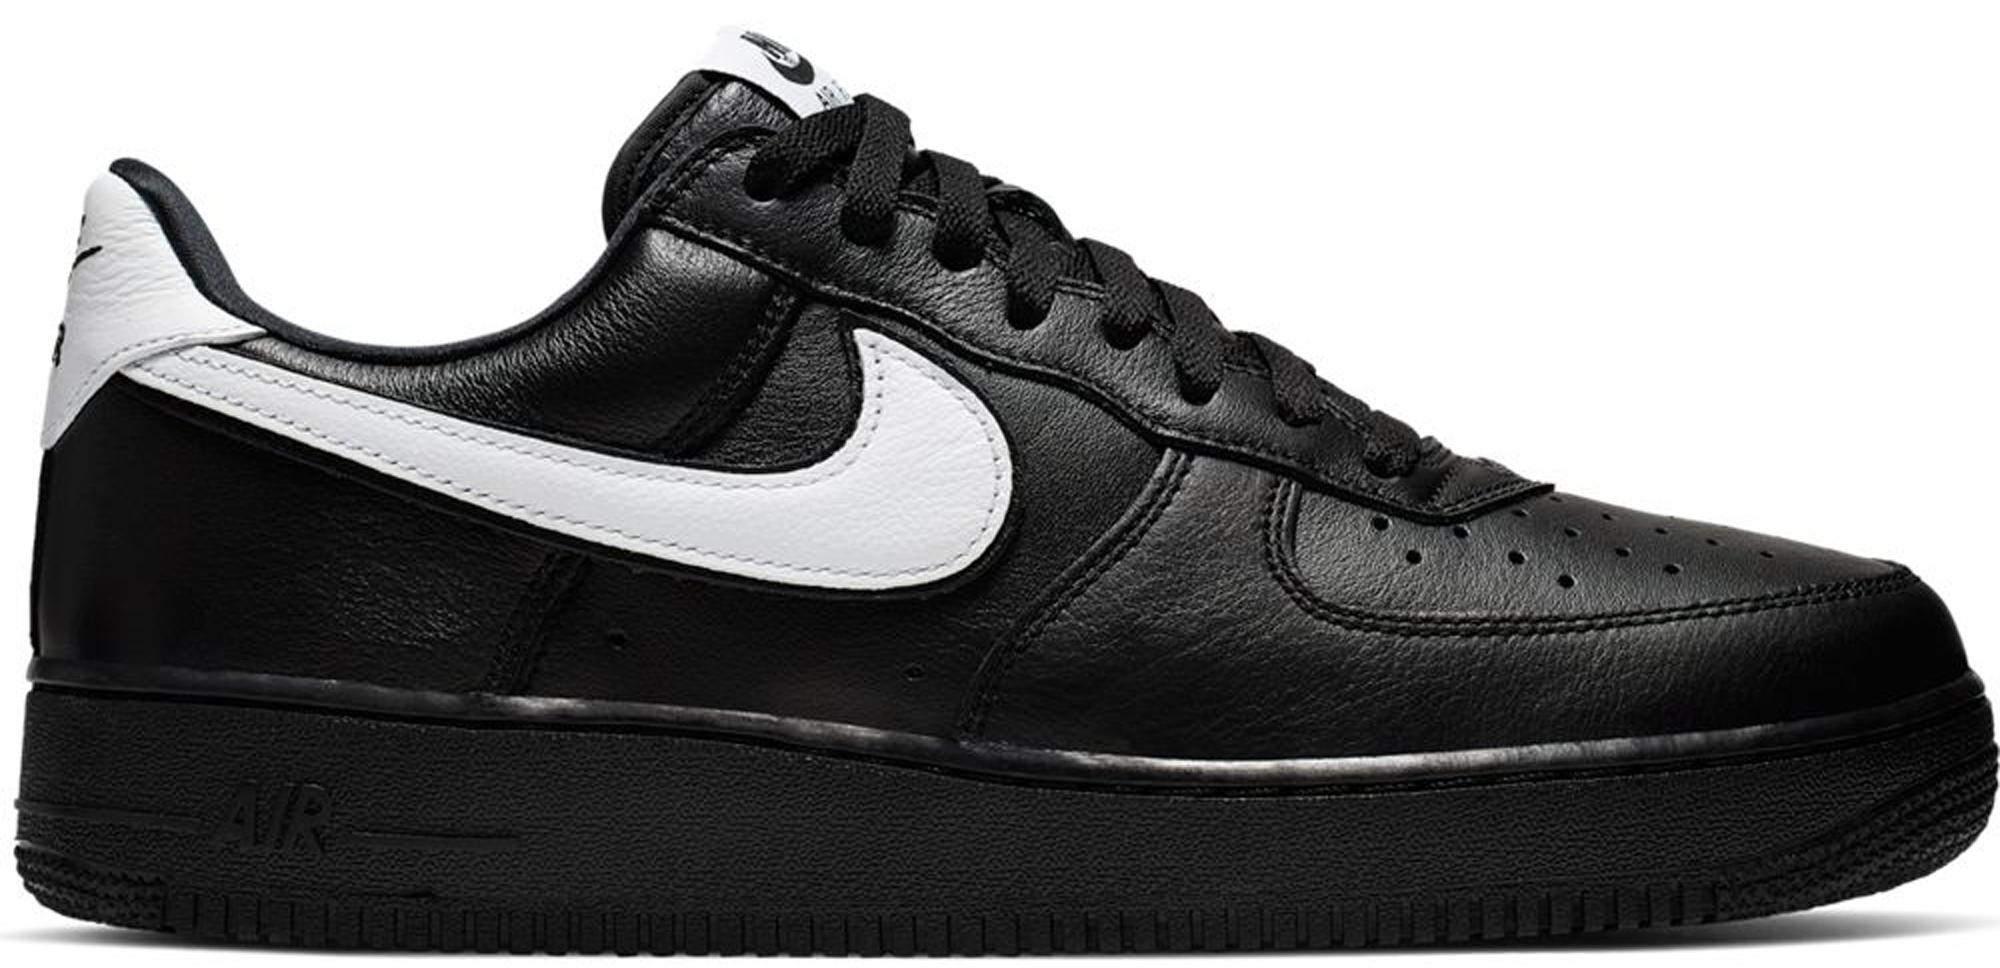 Nike Air Force 1 Low QS Black White